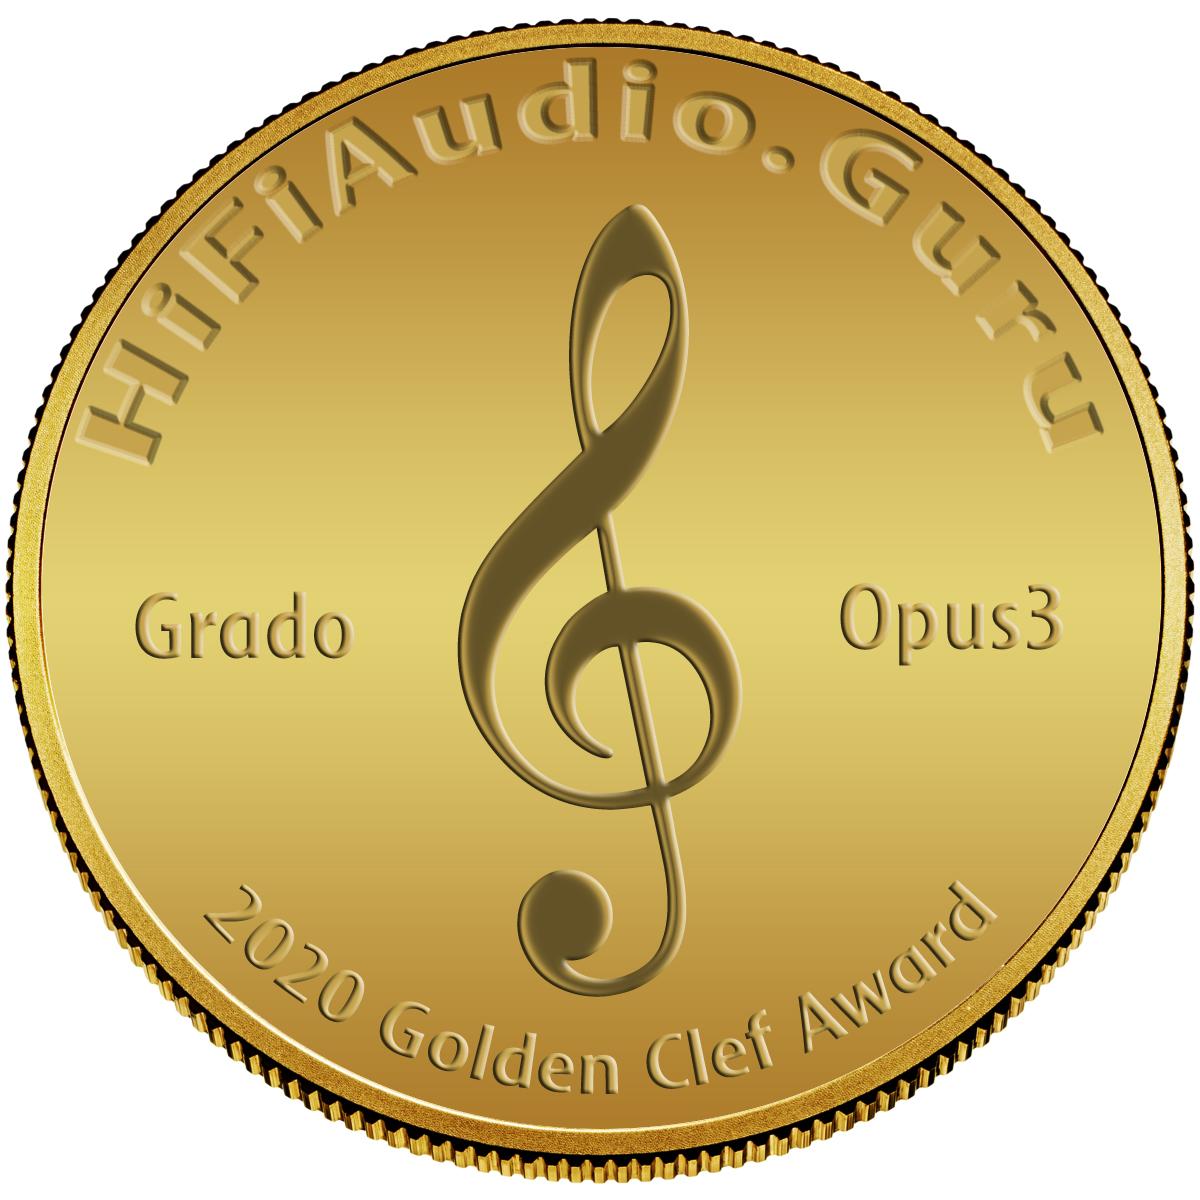 Grado Opus3 Maple Bodied Phono Cartridge